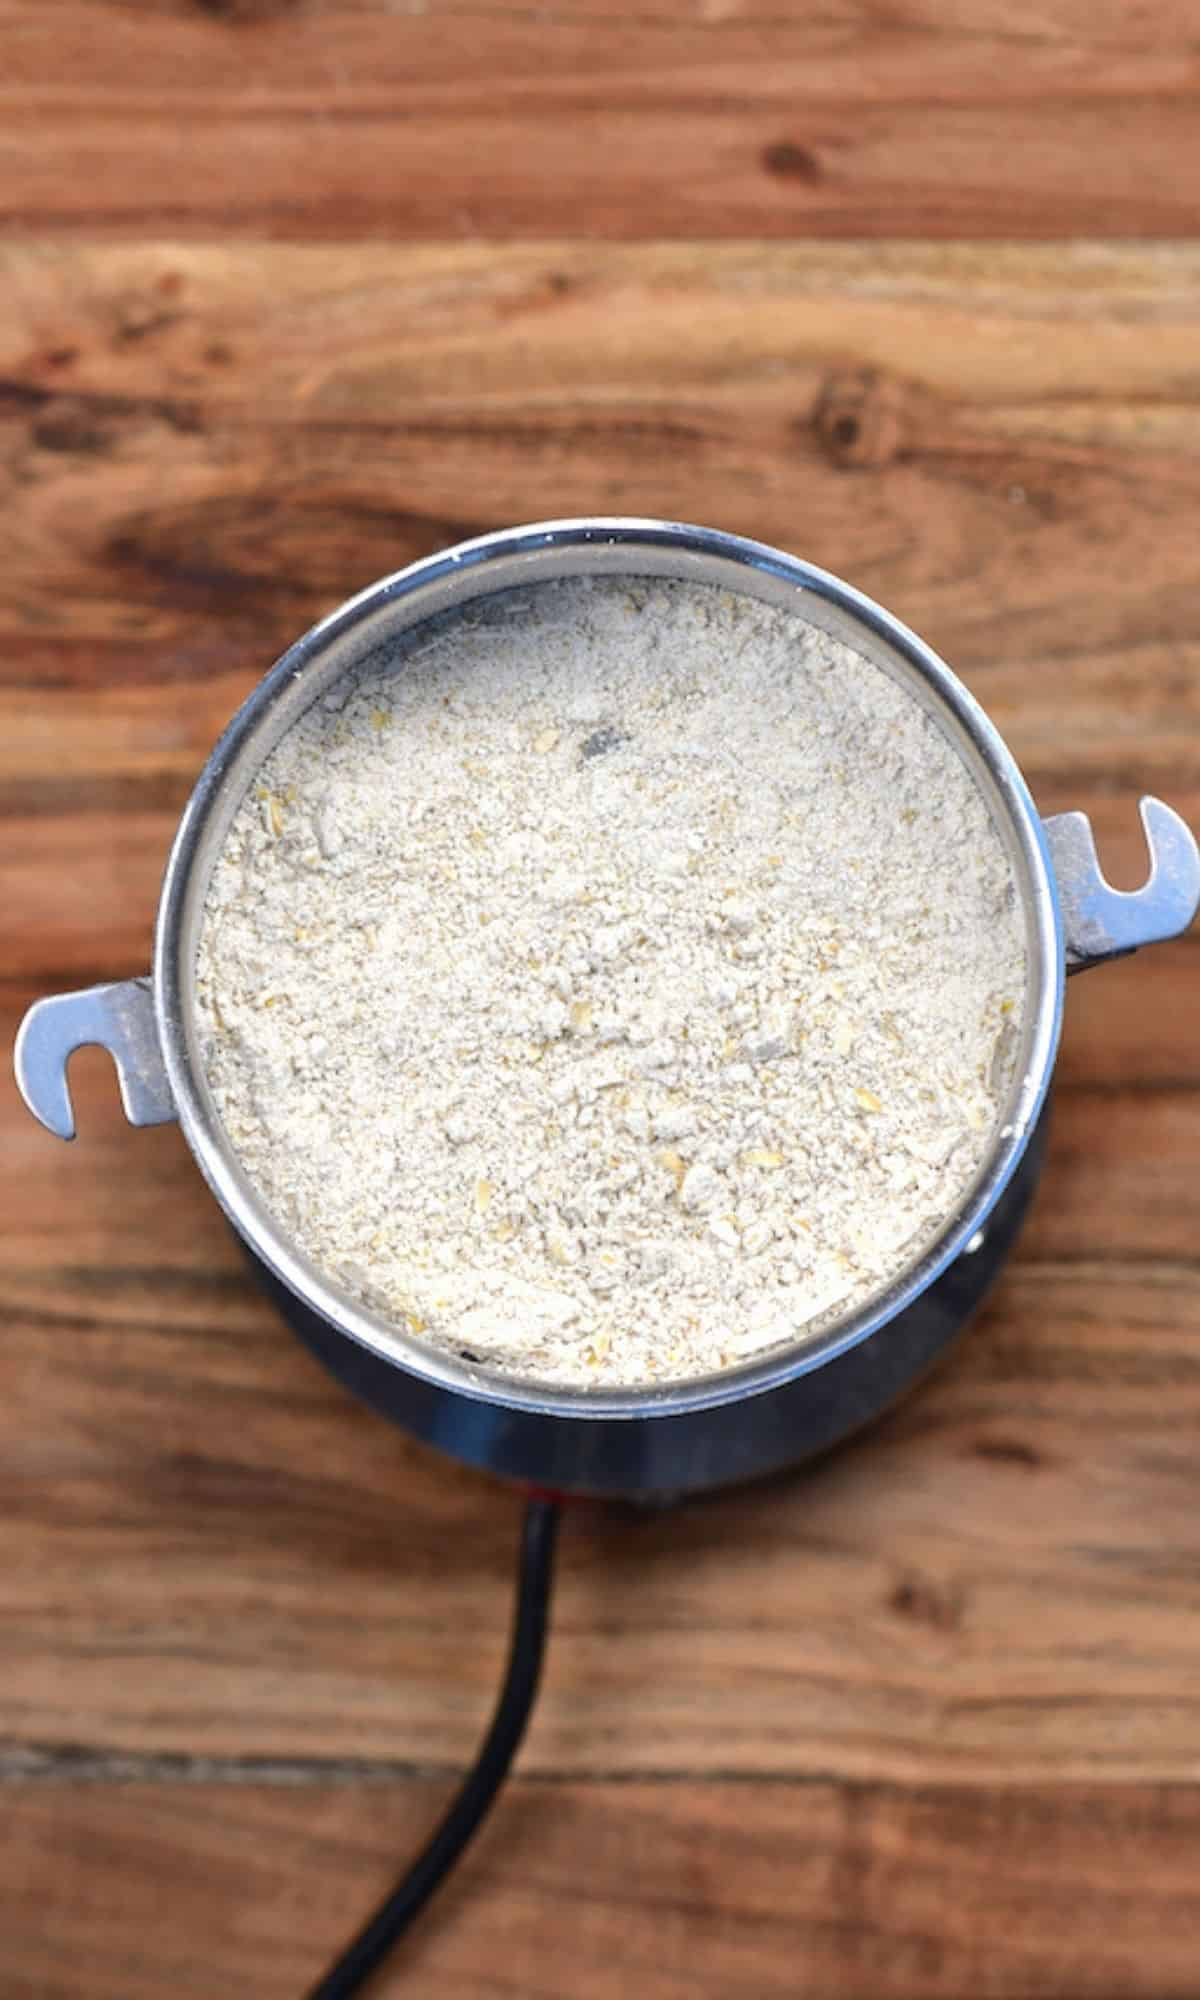 Oat flour in a grinder